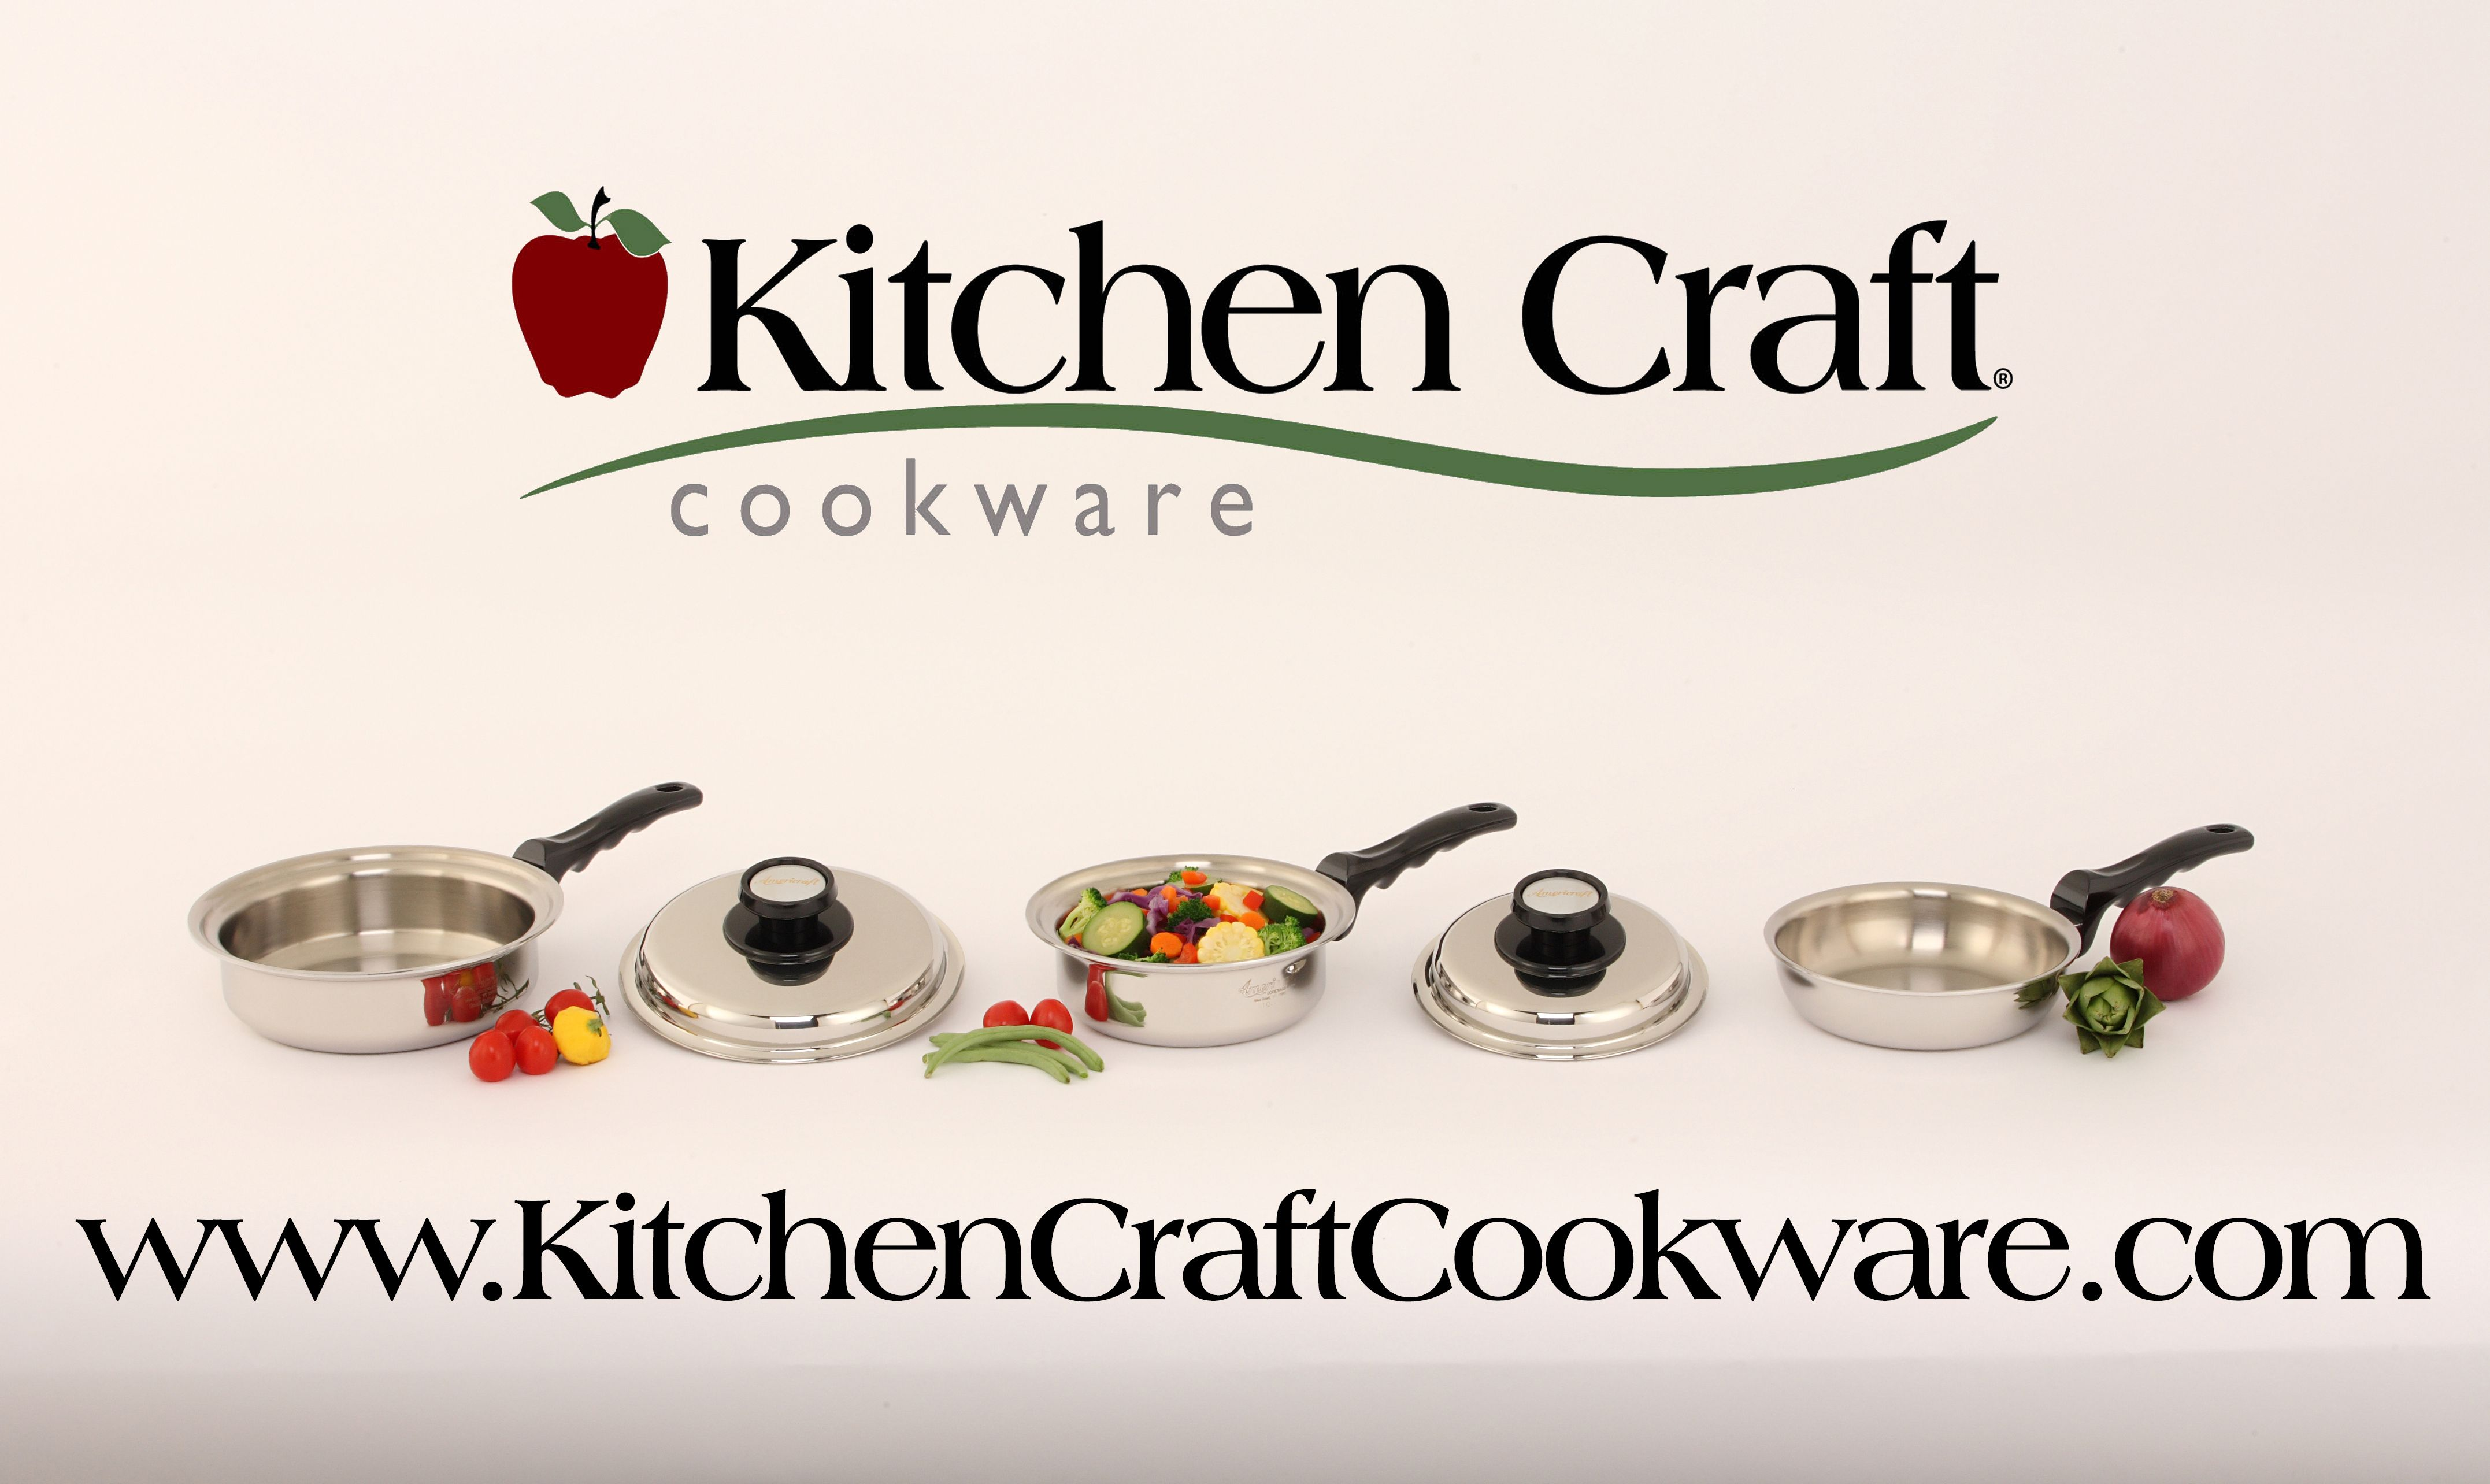 44+ Town craft cookware recipes info